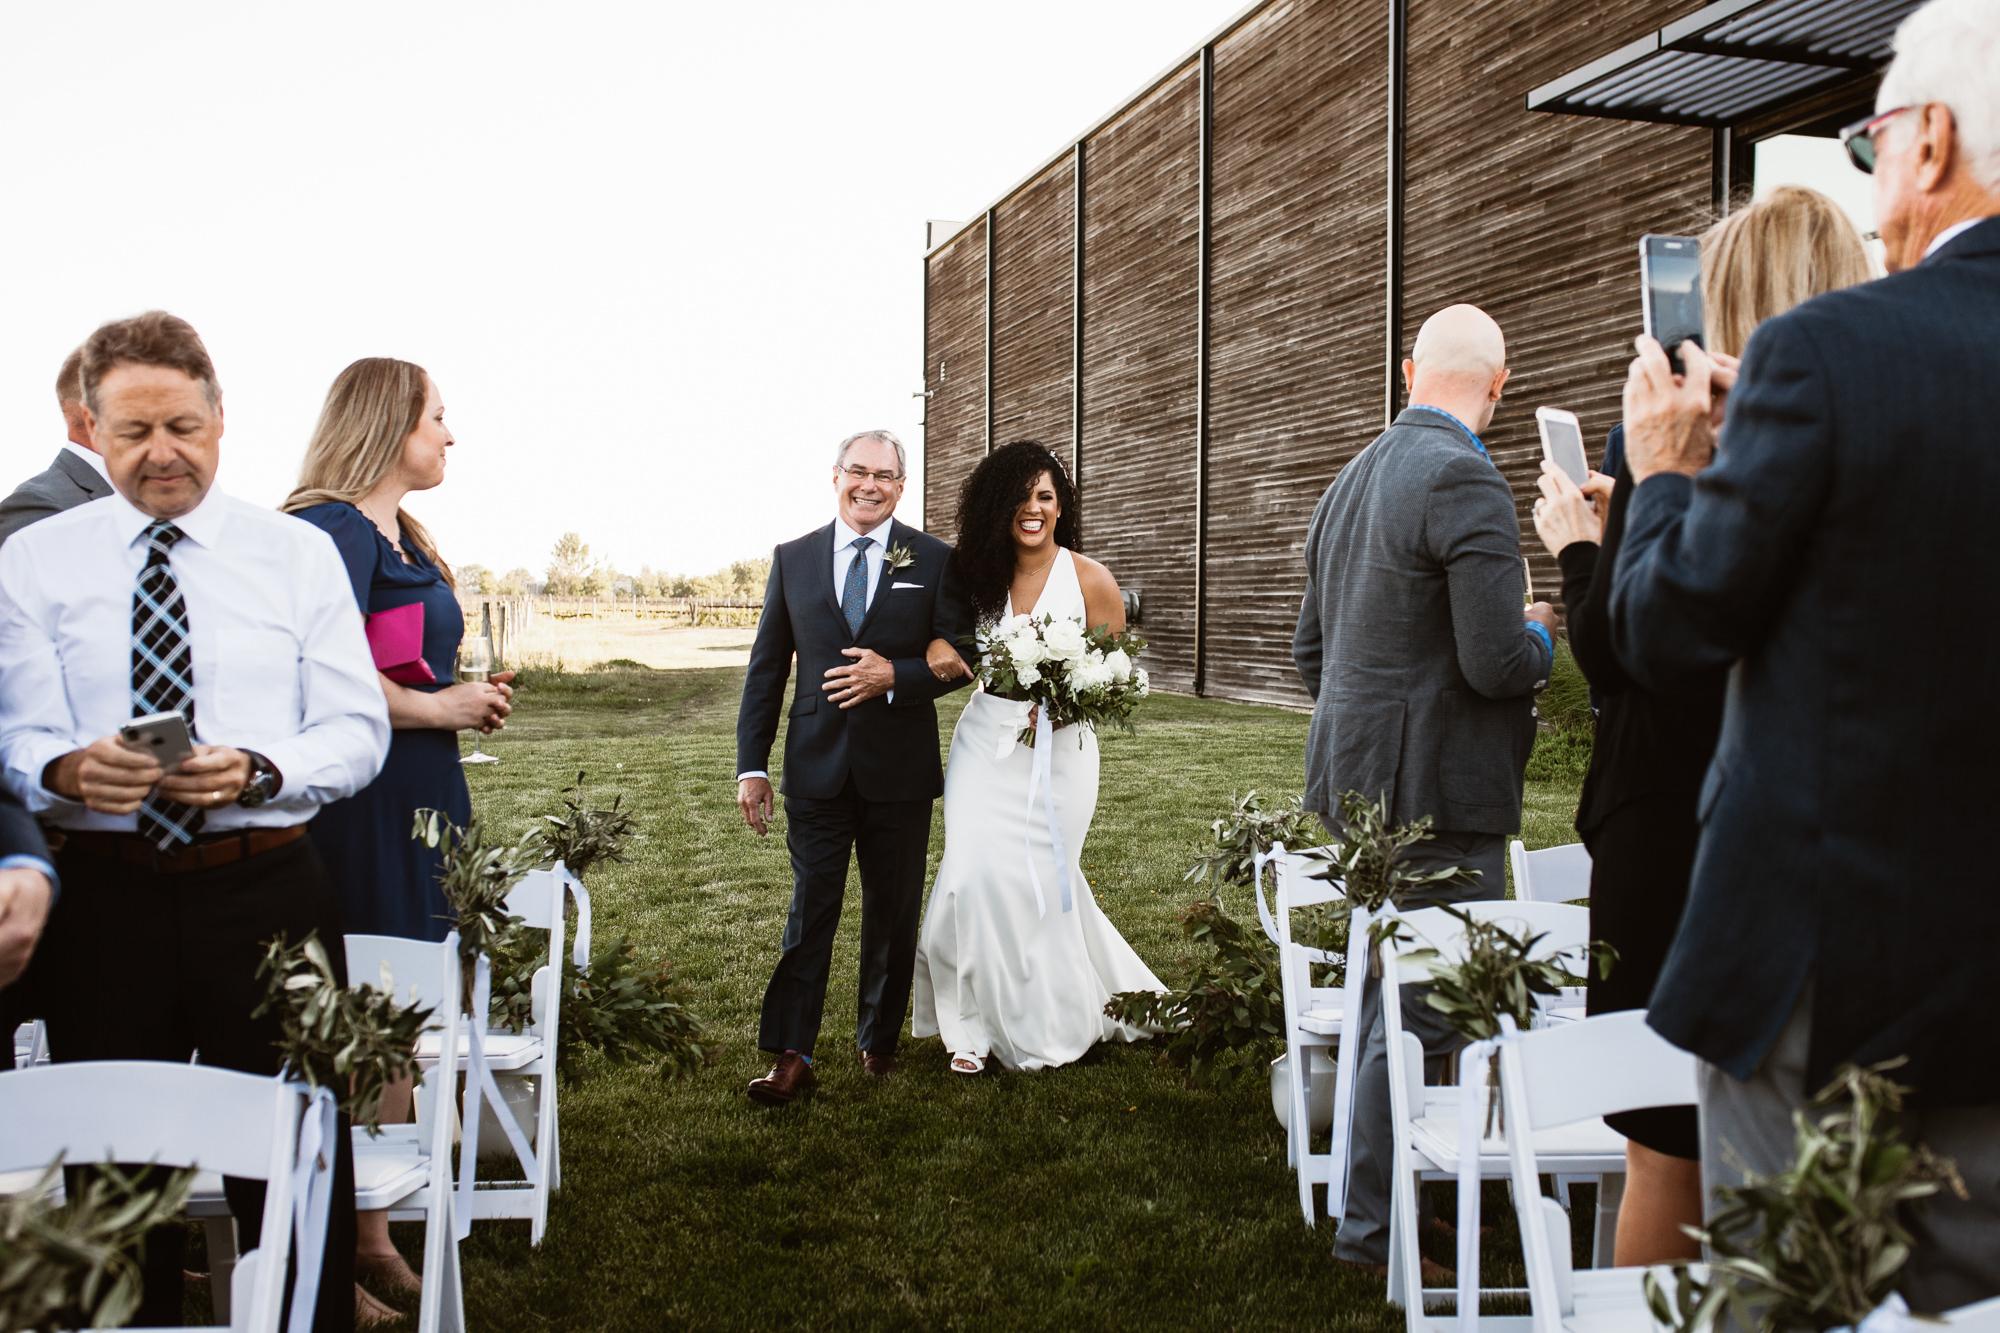 stratus-winery-wedding-vineyard-wedding-vineyard-bride-photo-by-reed-photography-038.jpg